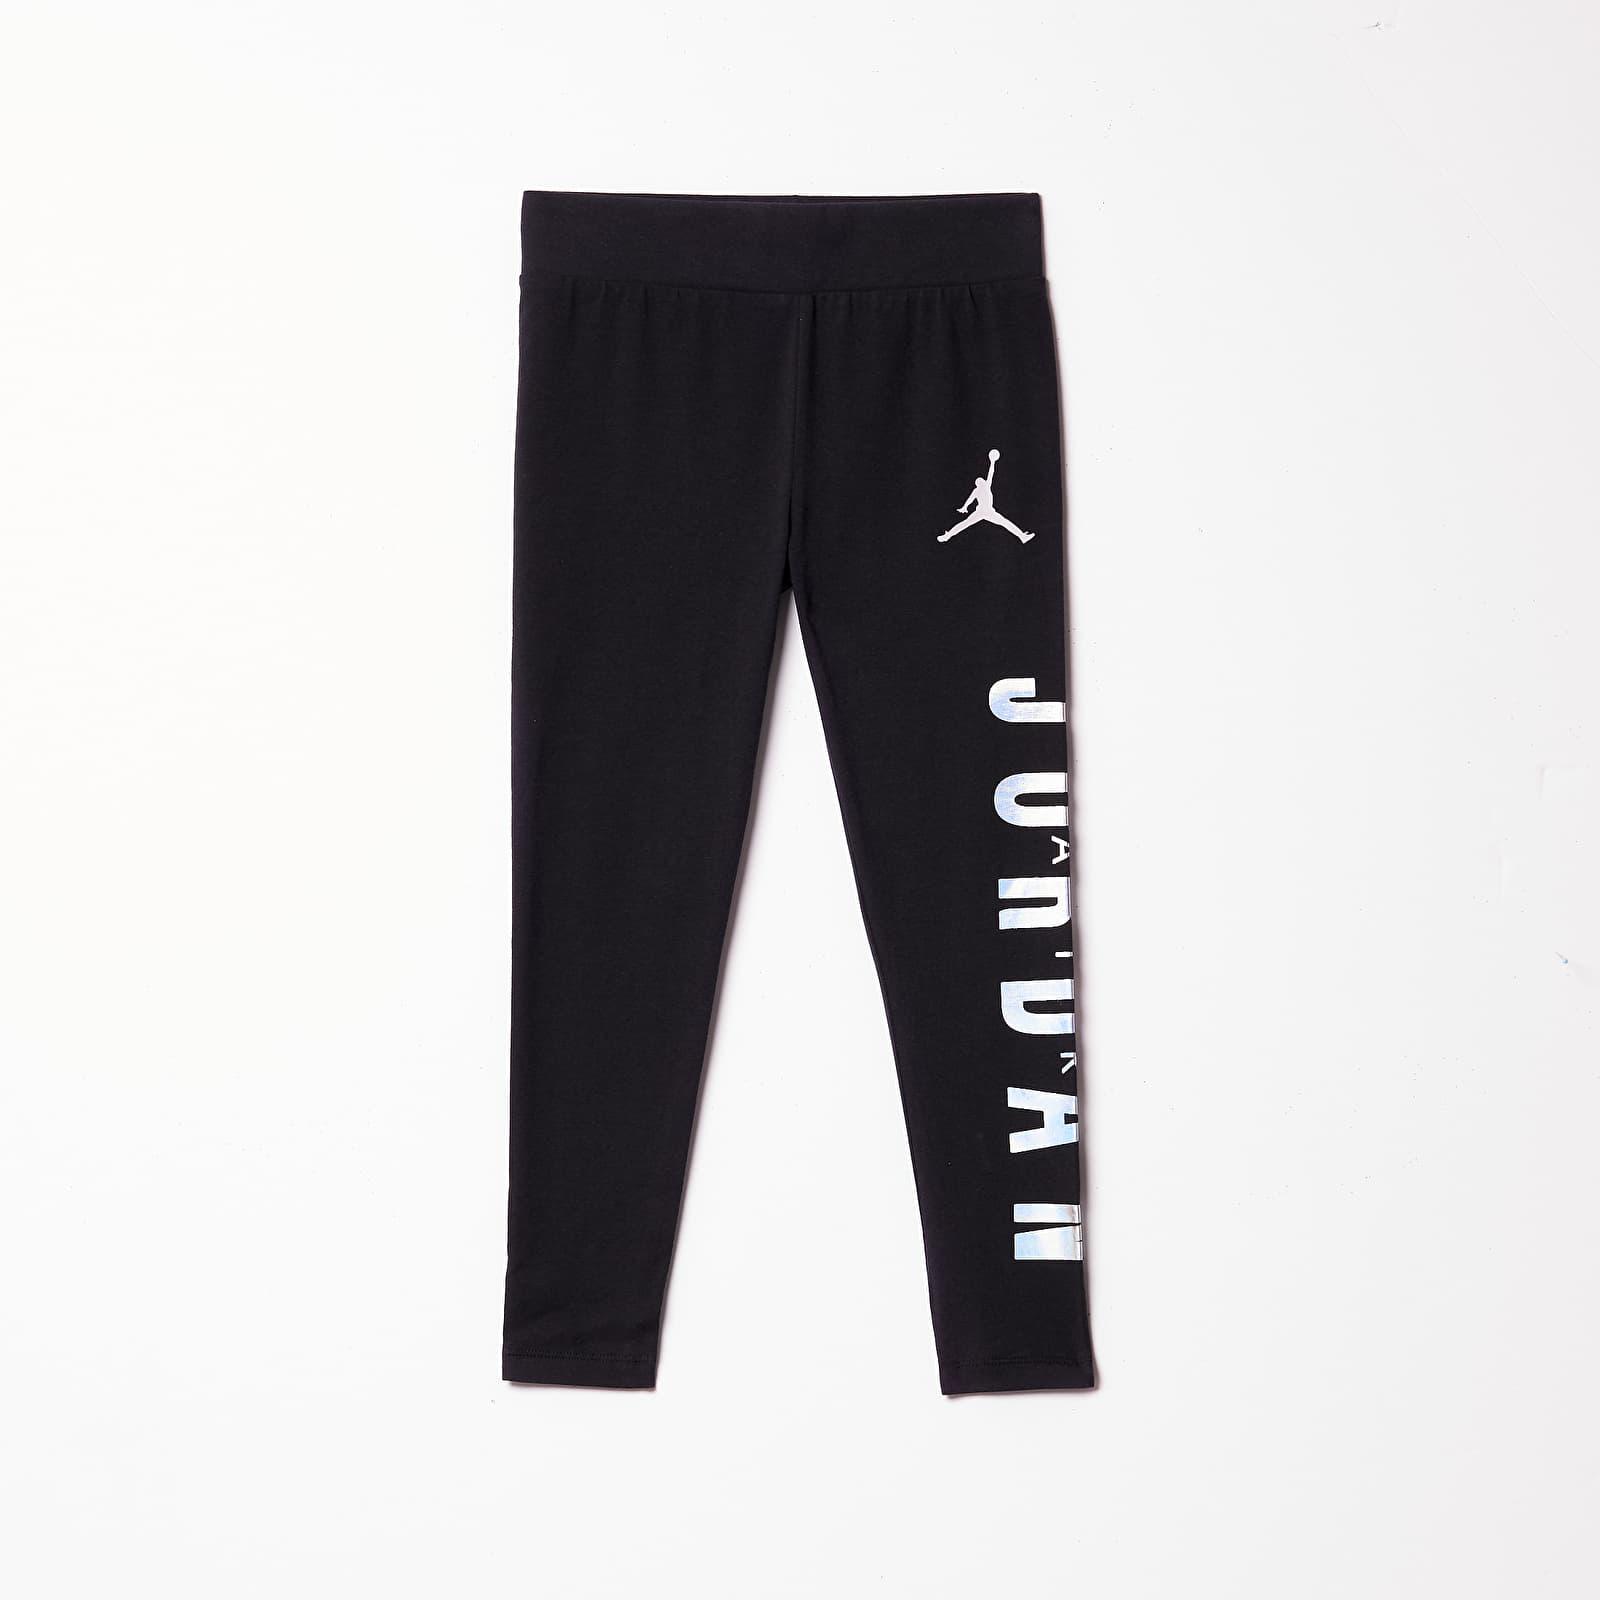 Detské oblečenie Jordan Jdg Color-Blocked Legging Black